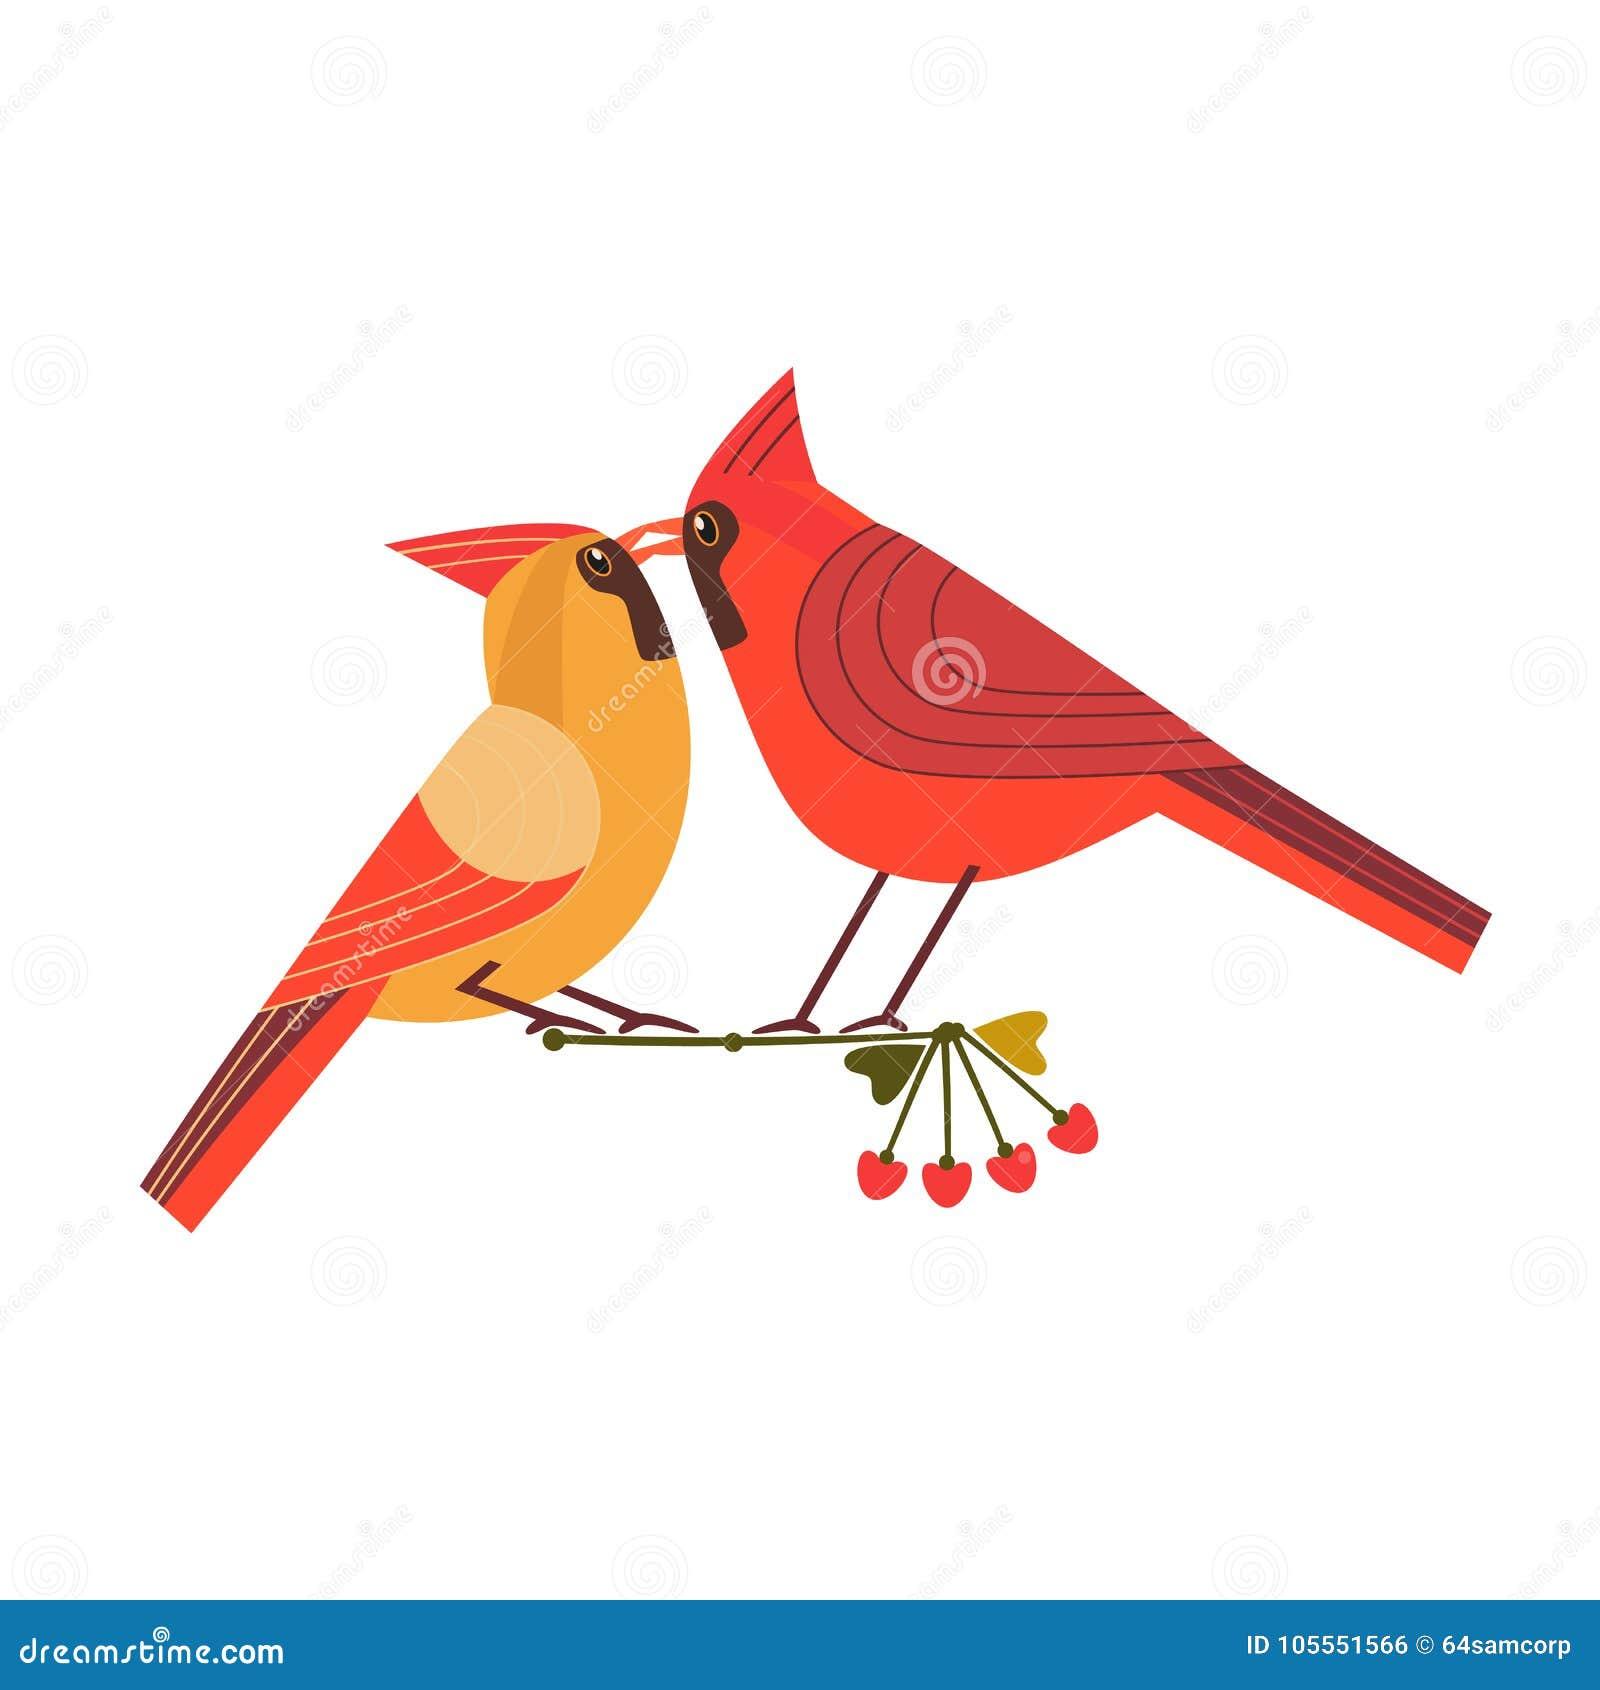 Kissing birds icon stock vector. Illustration of love - 105551566